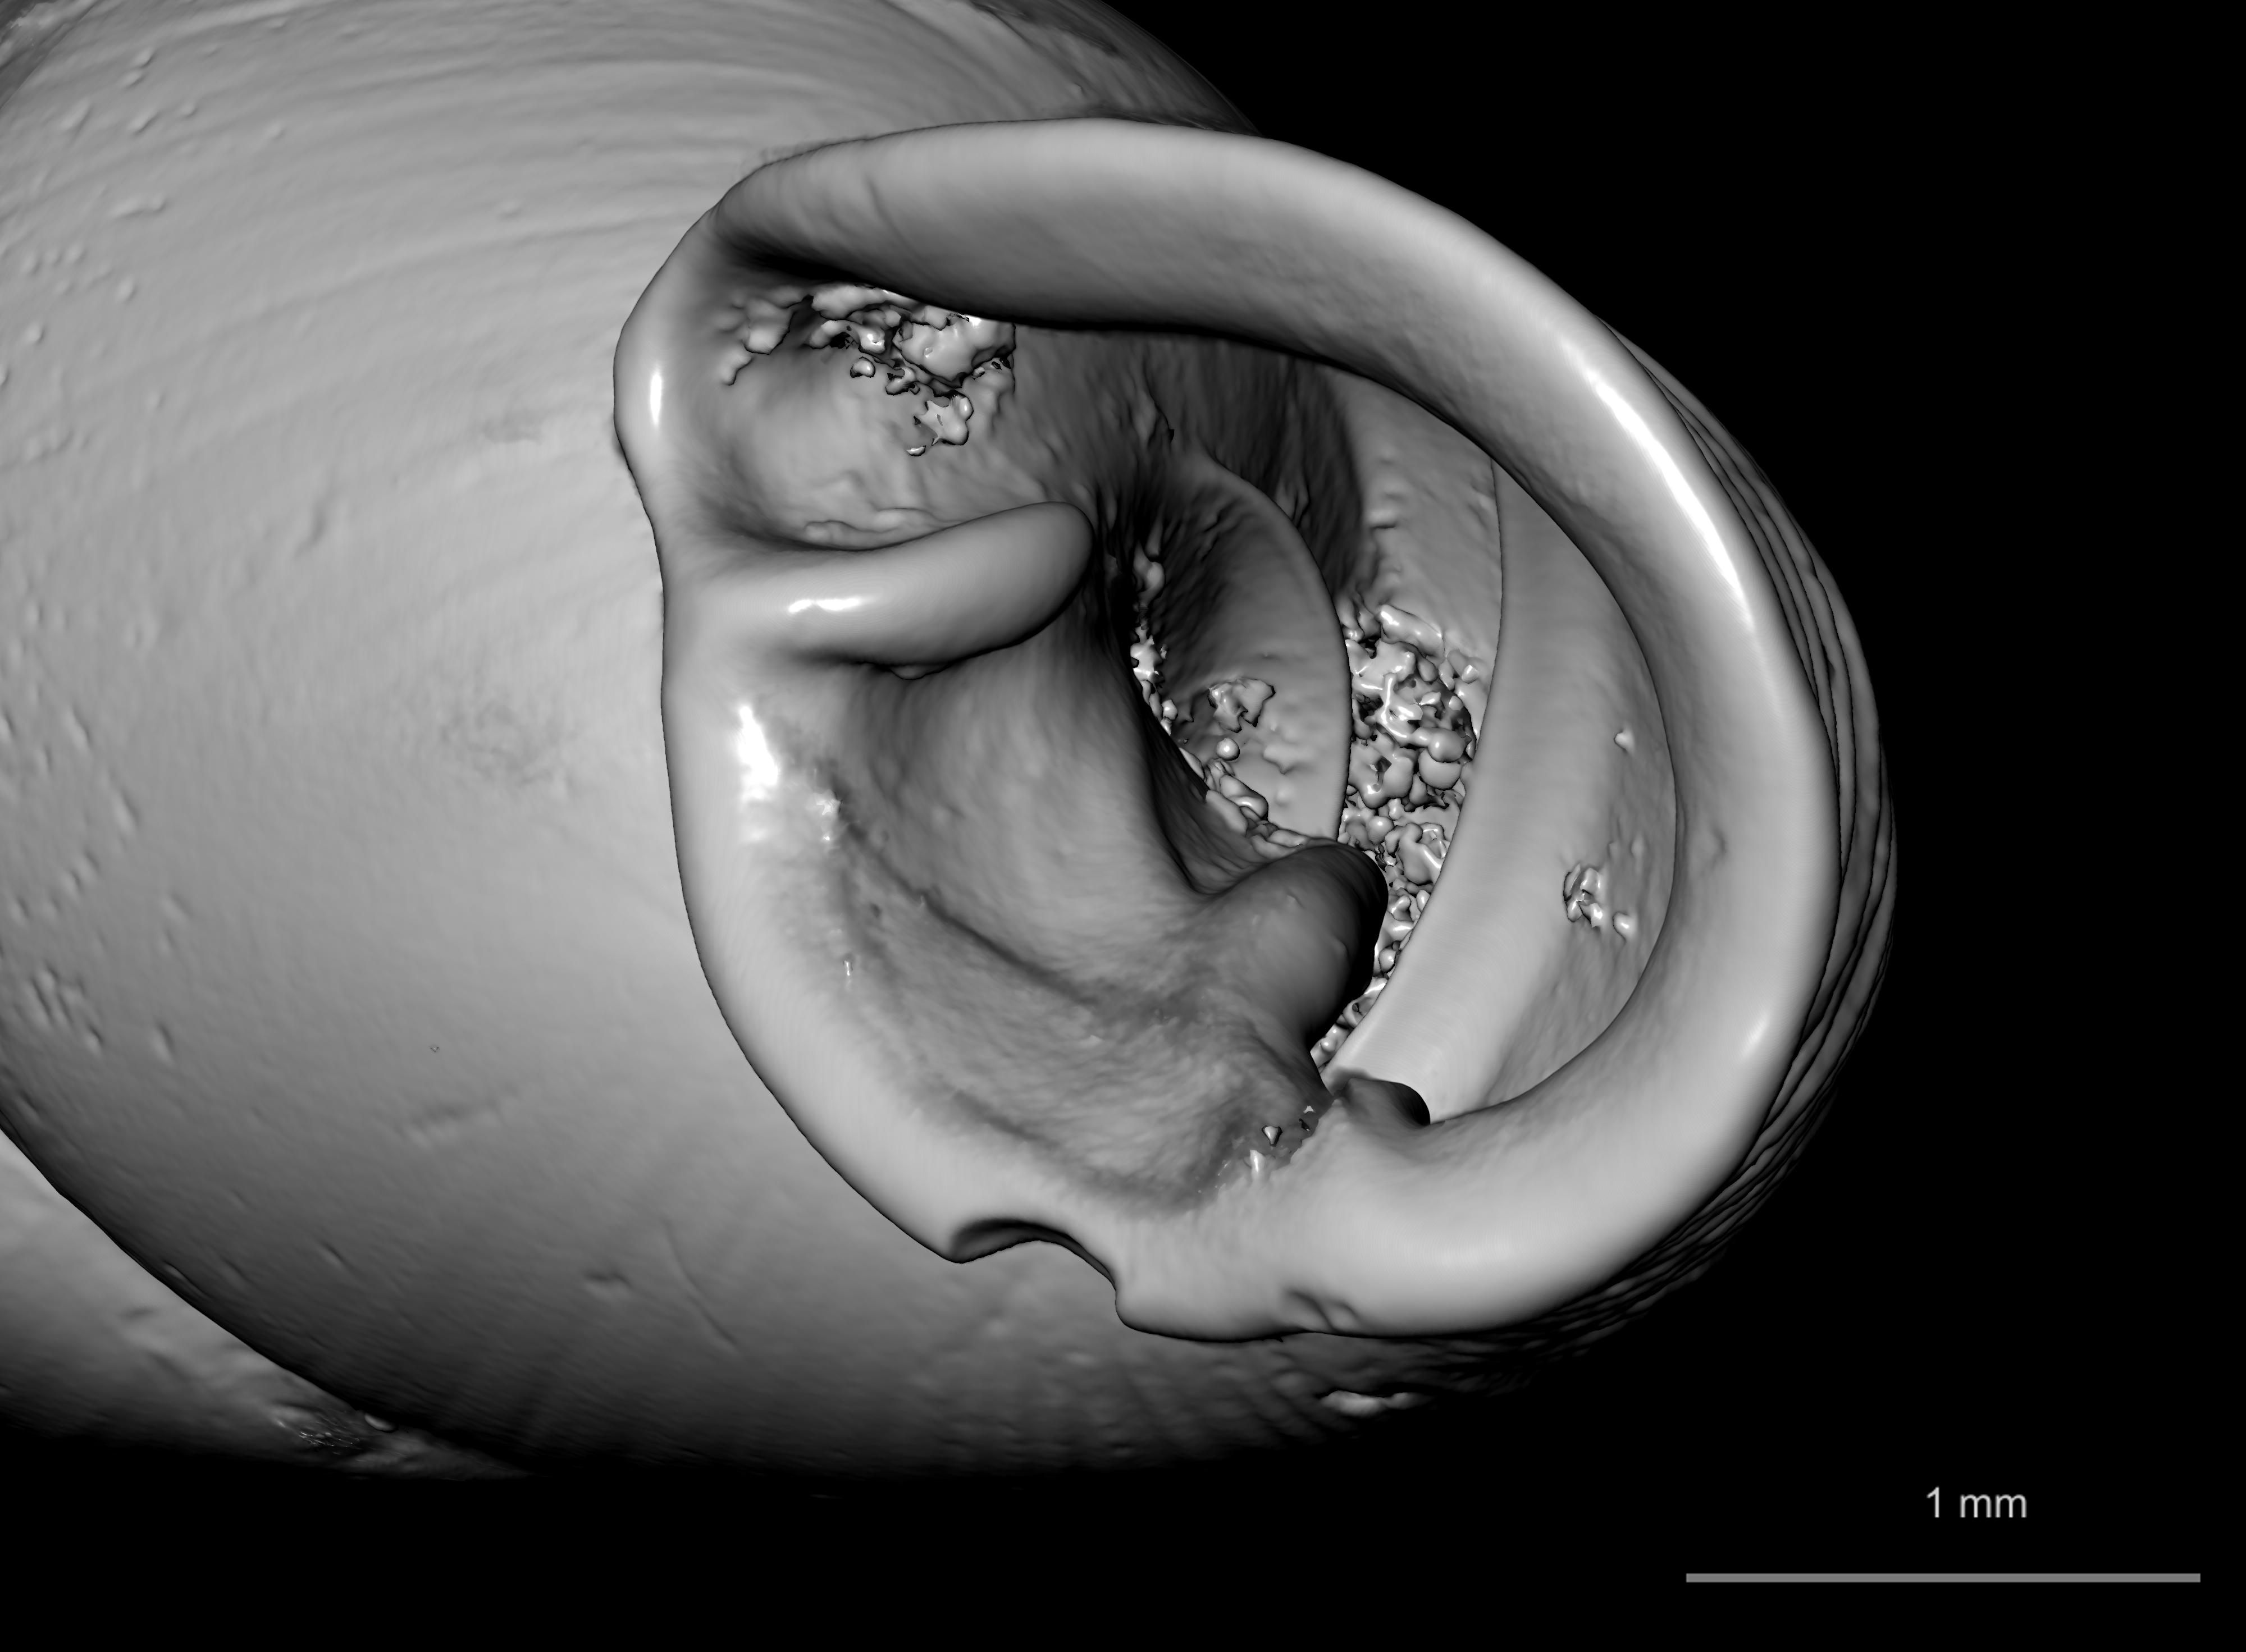 BE-RBINS-INV SYNTYPE MT 2415 Clausilia flaveola OBLIQUE ZOOM MCT XRE.jpg